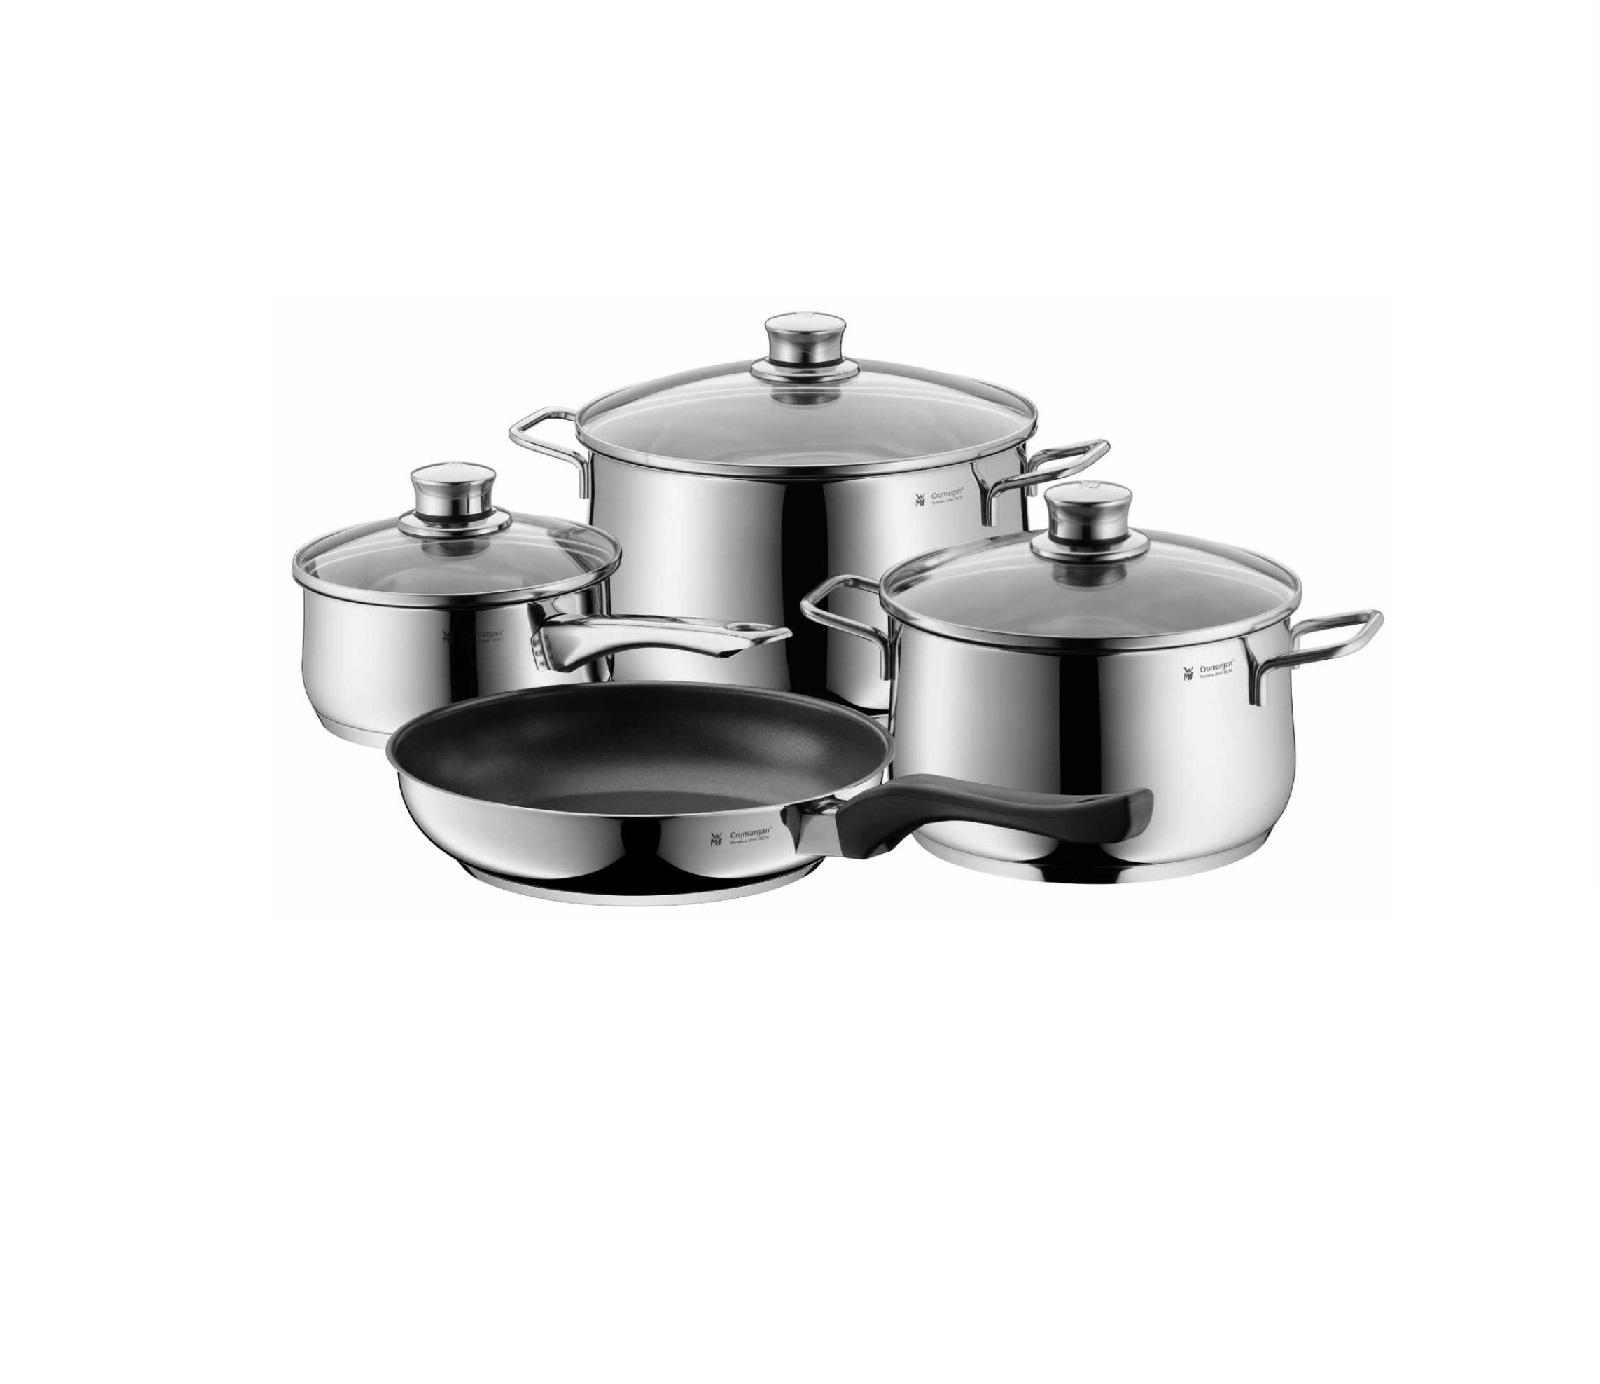 Набор кухонной посуды WMF DIADEM PLUS, кастрюля: 20 см х 3,5 л; 24 см х 6 л; ковш: 16 см х 1,5 л; сковорода 24 см, серебристый, 4 предмета WMF 07 3027 6040 PROMO фото 1